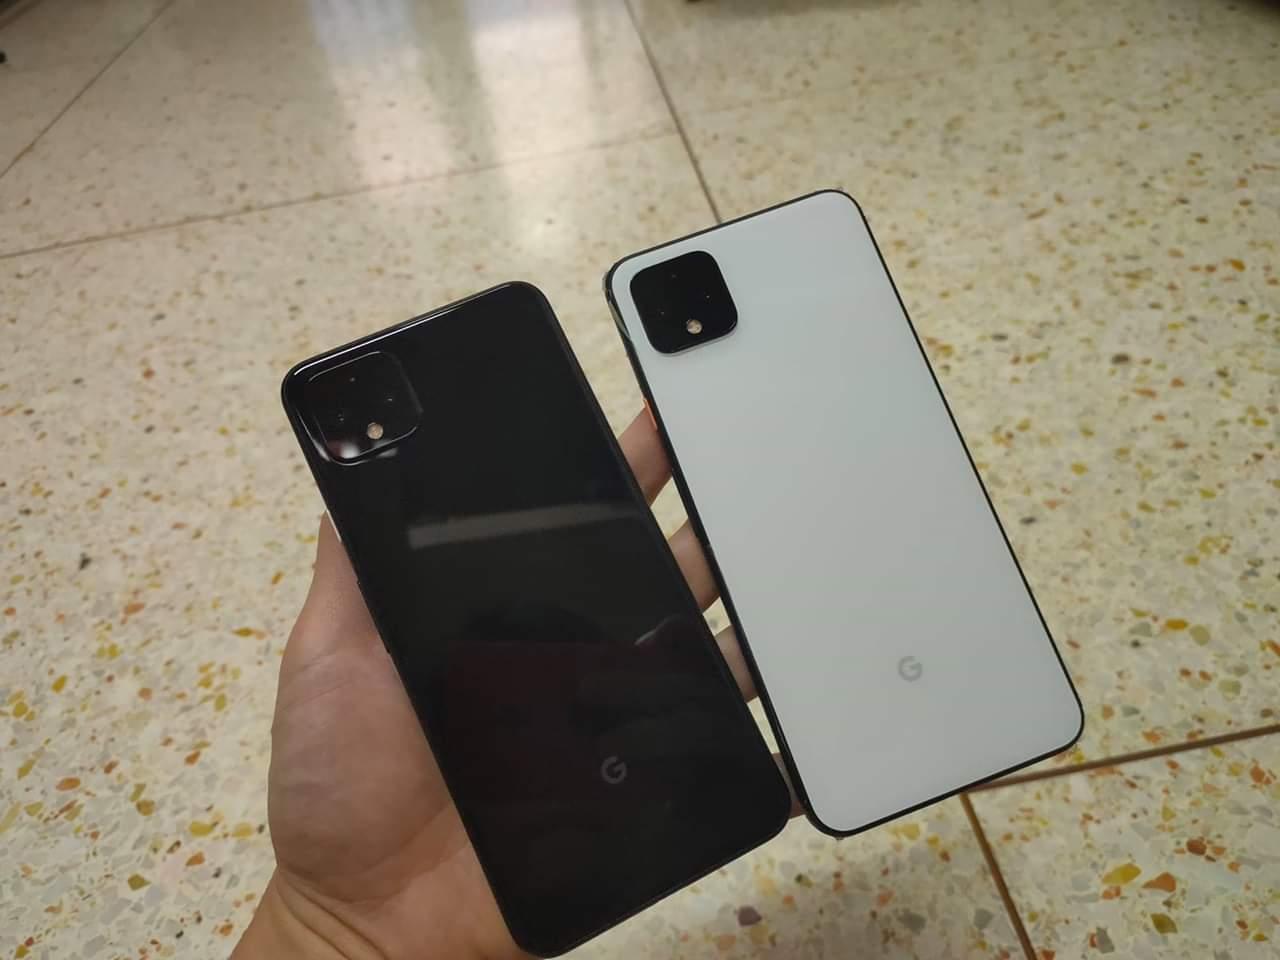 Google-Pixel-4-XL-white-and-black-leak